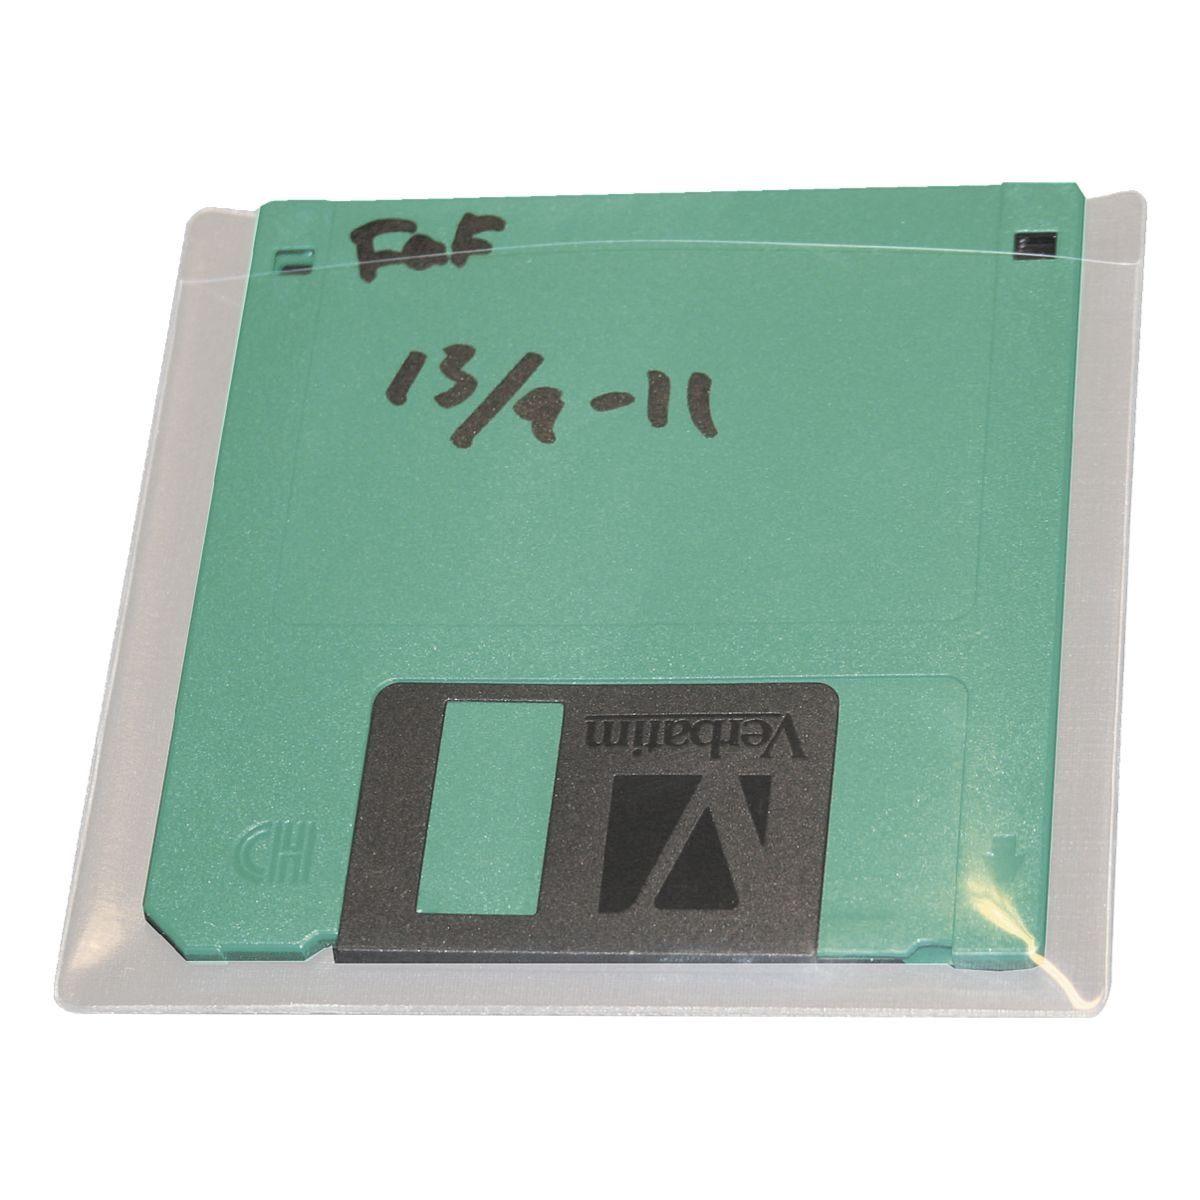 Probeco Diskettenhüllen